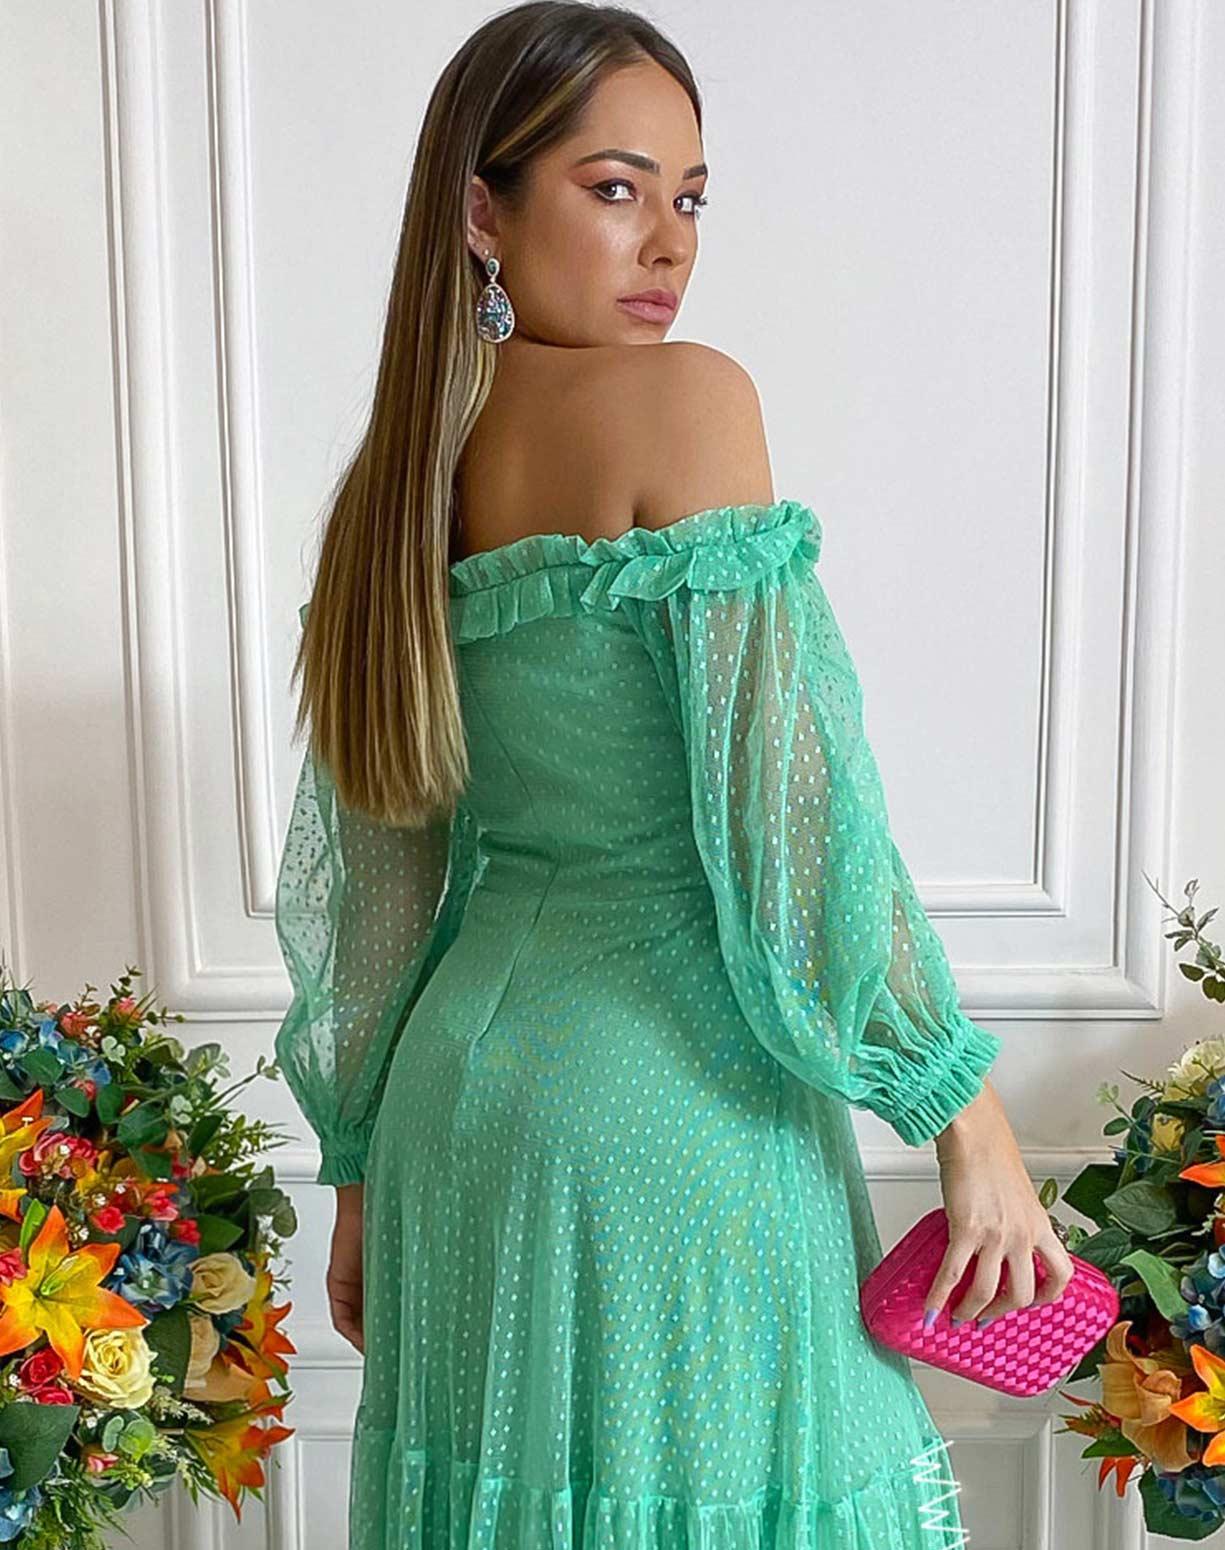 Vestido Verde Água Ombro a Ombro em Tule Texturizado